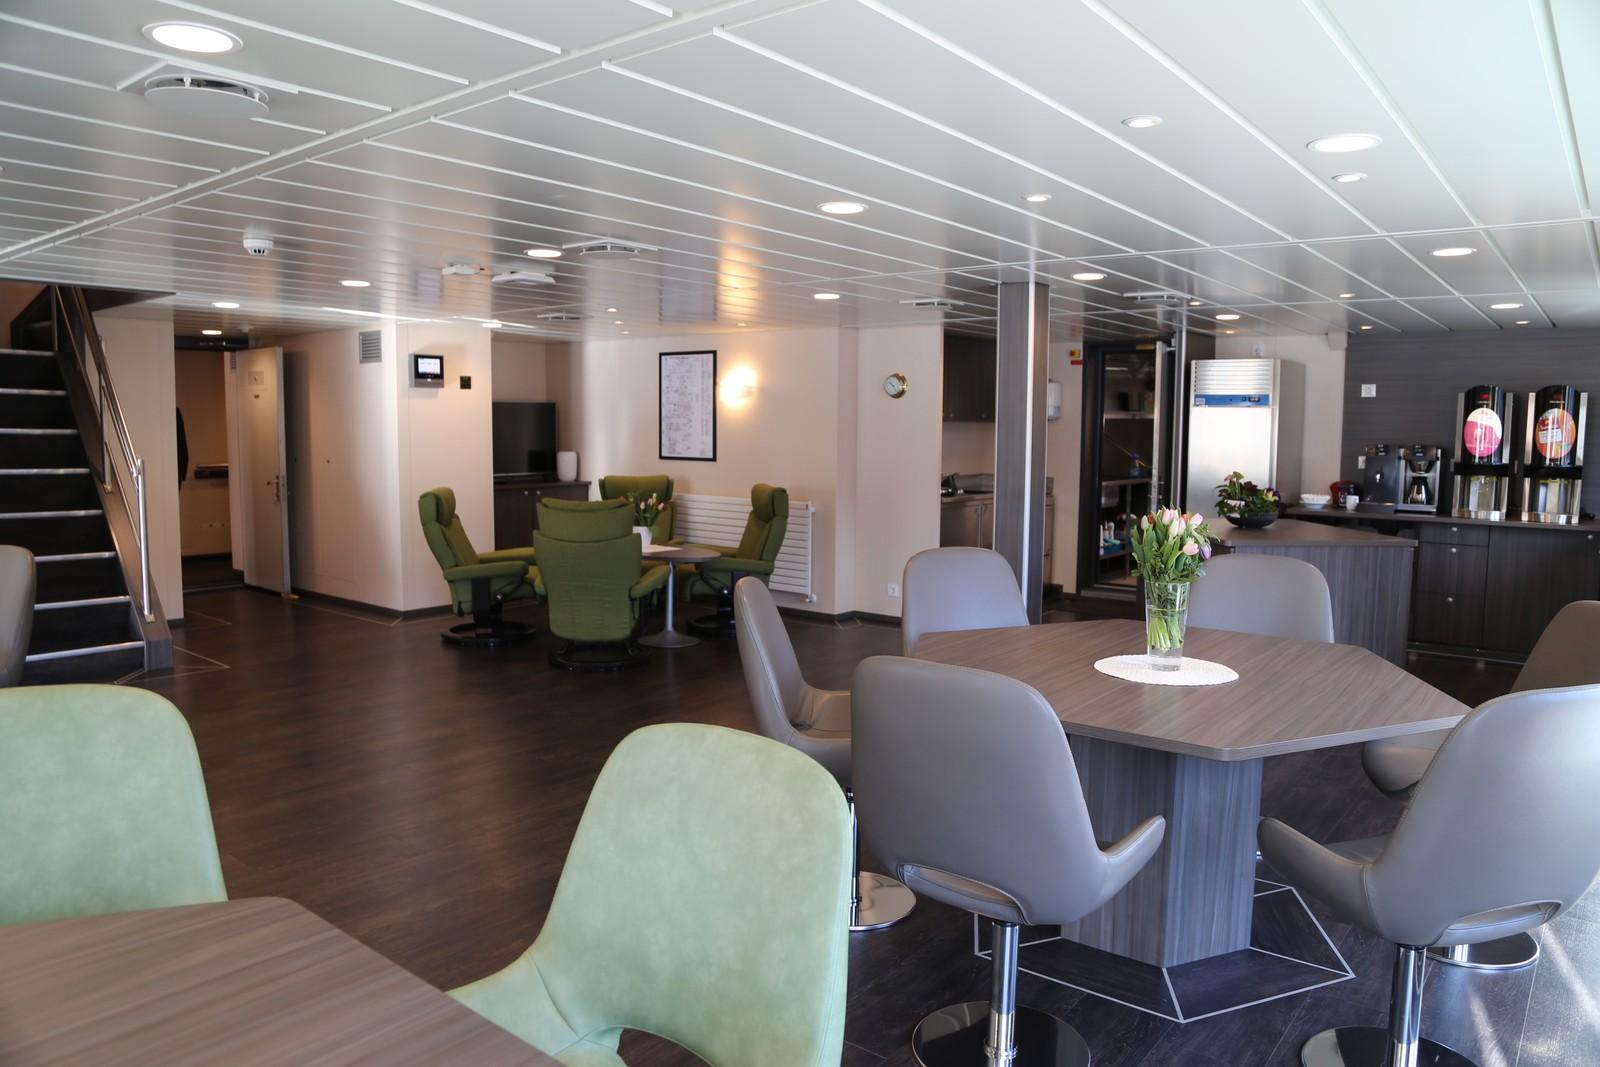 Kafeteriaen på tråleren er utstyrt med interiør i duse pasteller og moderne møbler.